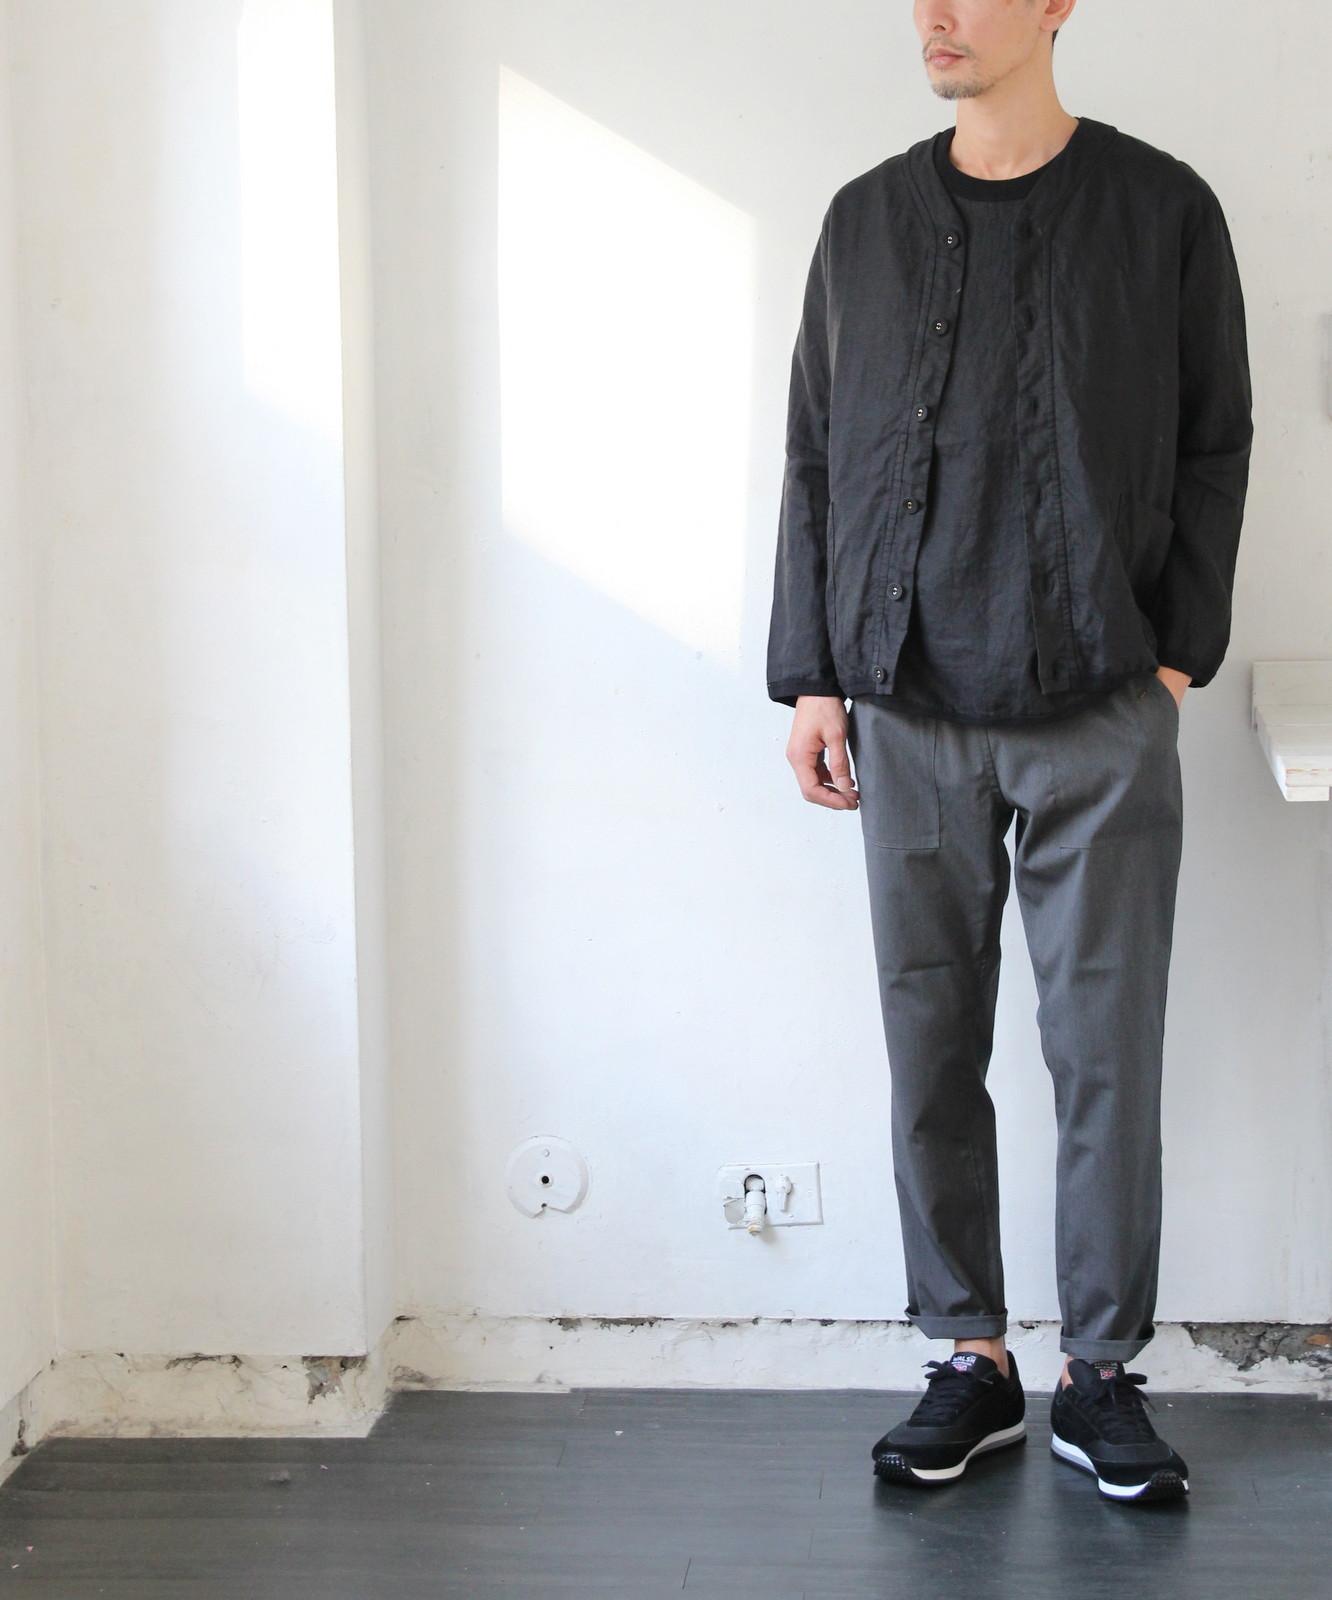 French Linen T-shirt_c0379477_05433430.jpg